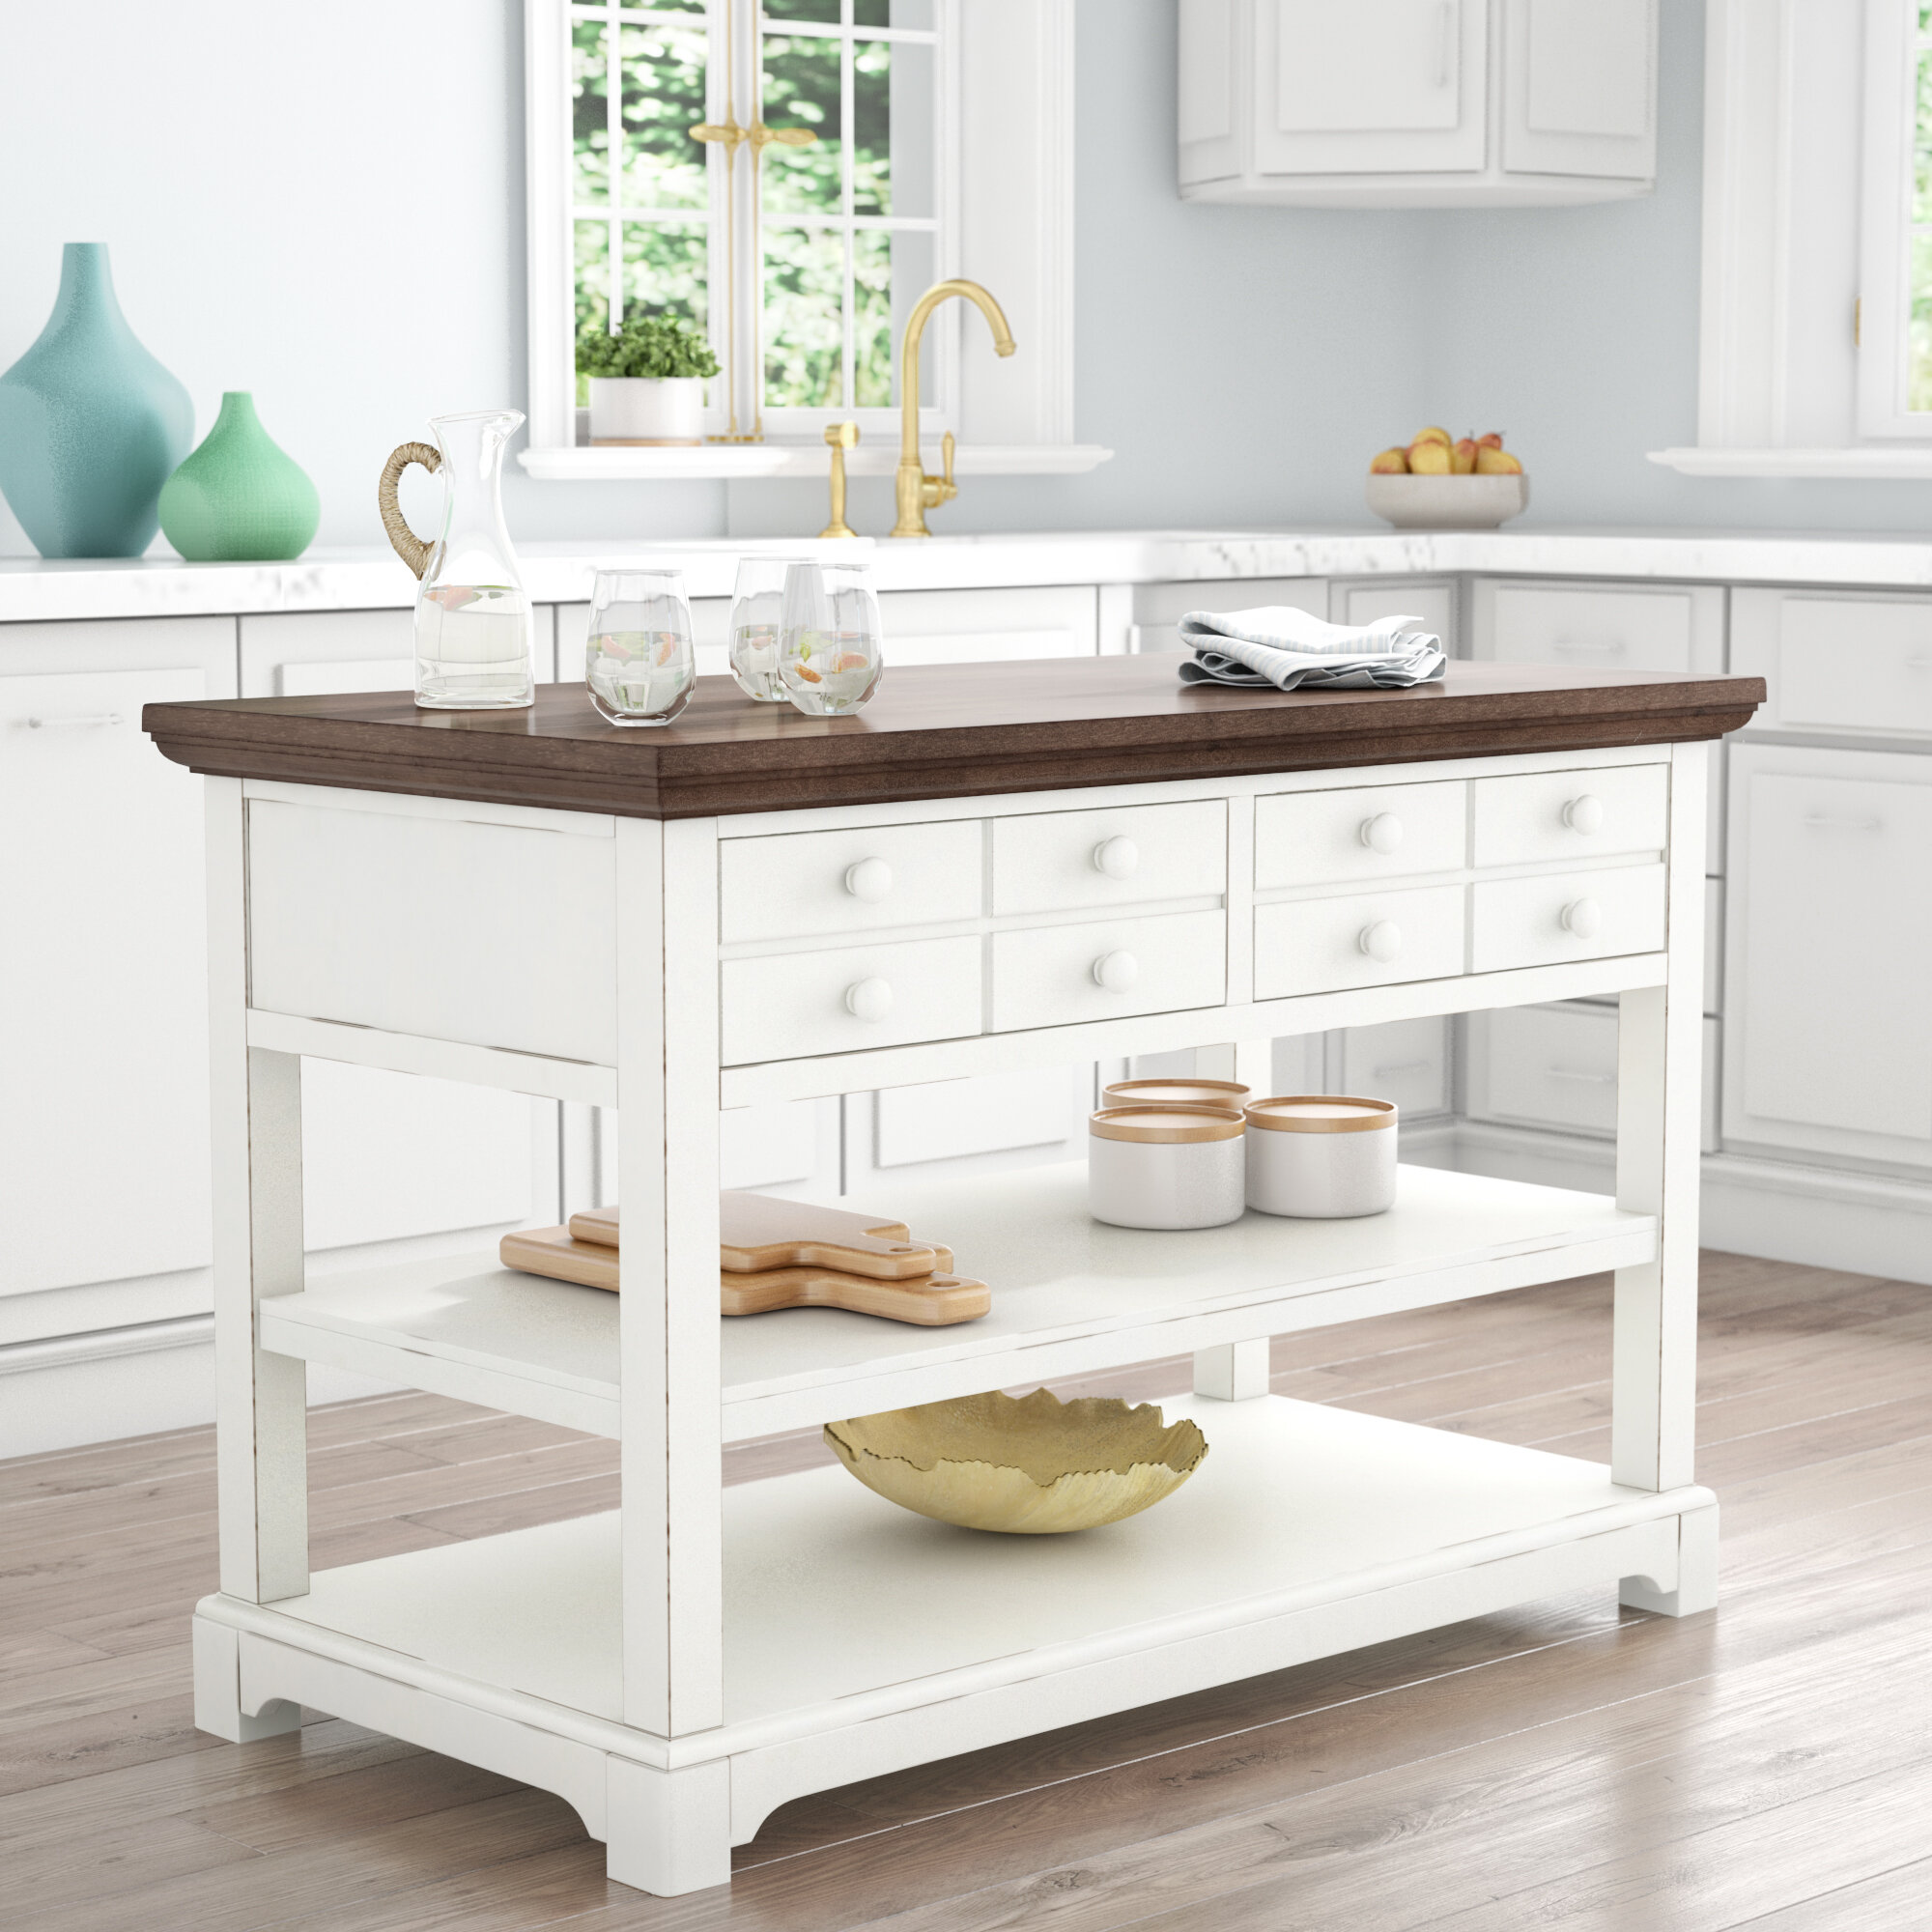 Rosecliff Heights Galliano Kitchen Island & Reviews   Wayfair